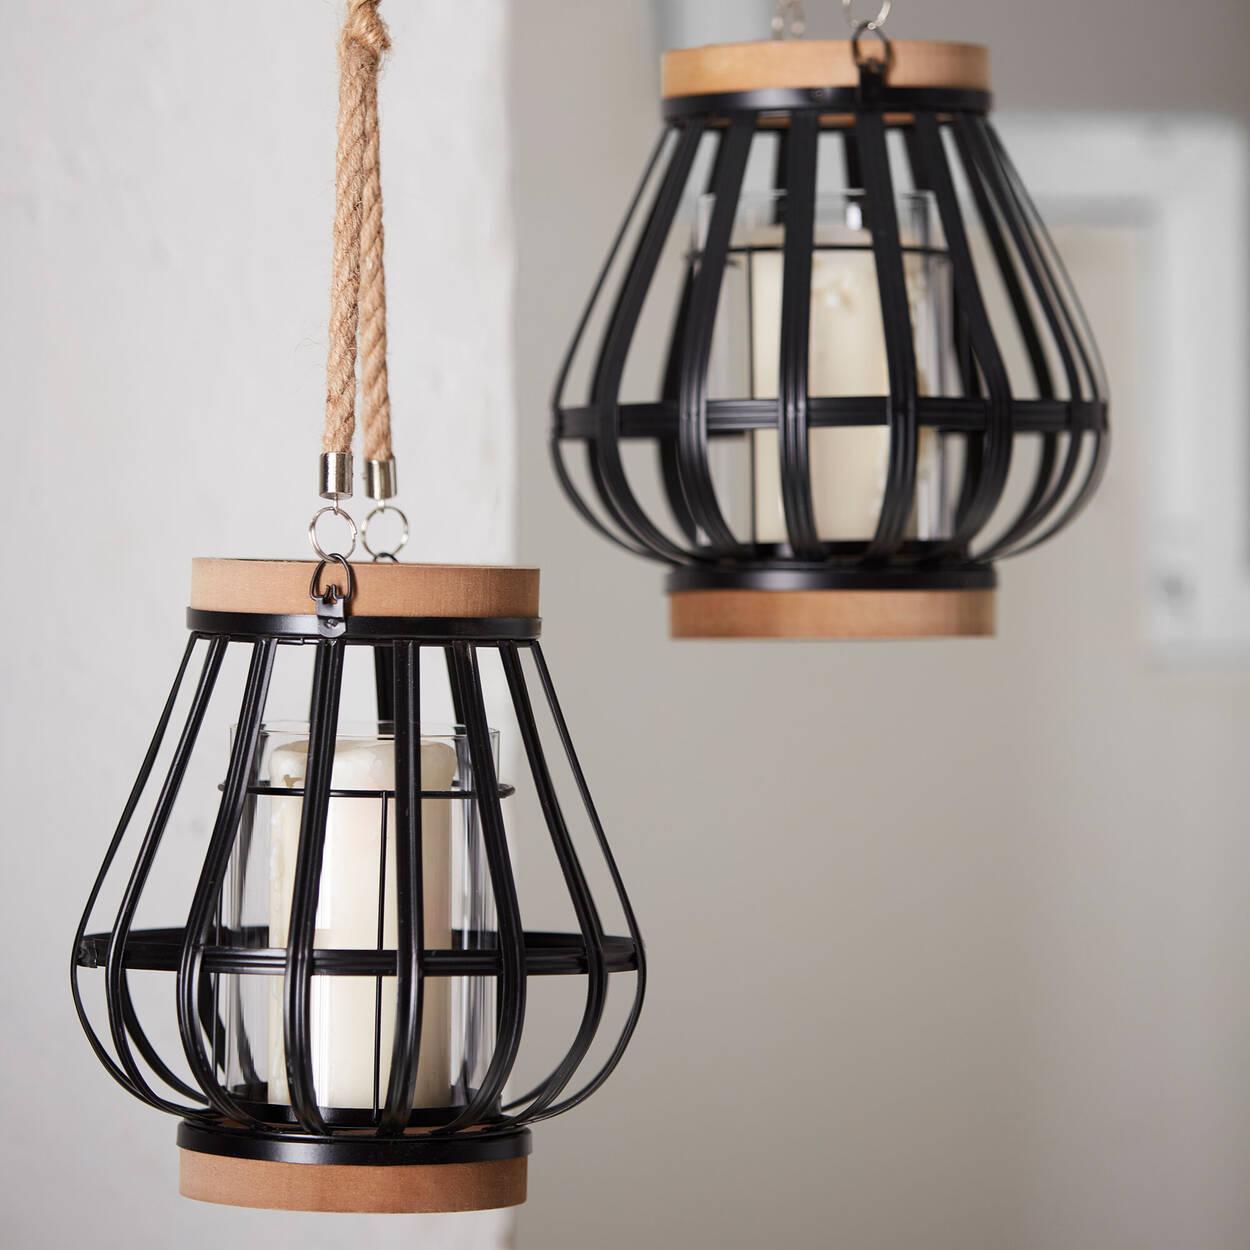 Wood-Like & Metal Lantern